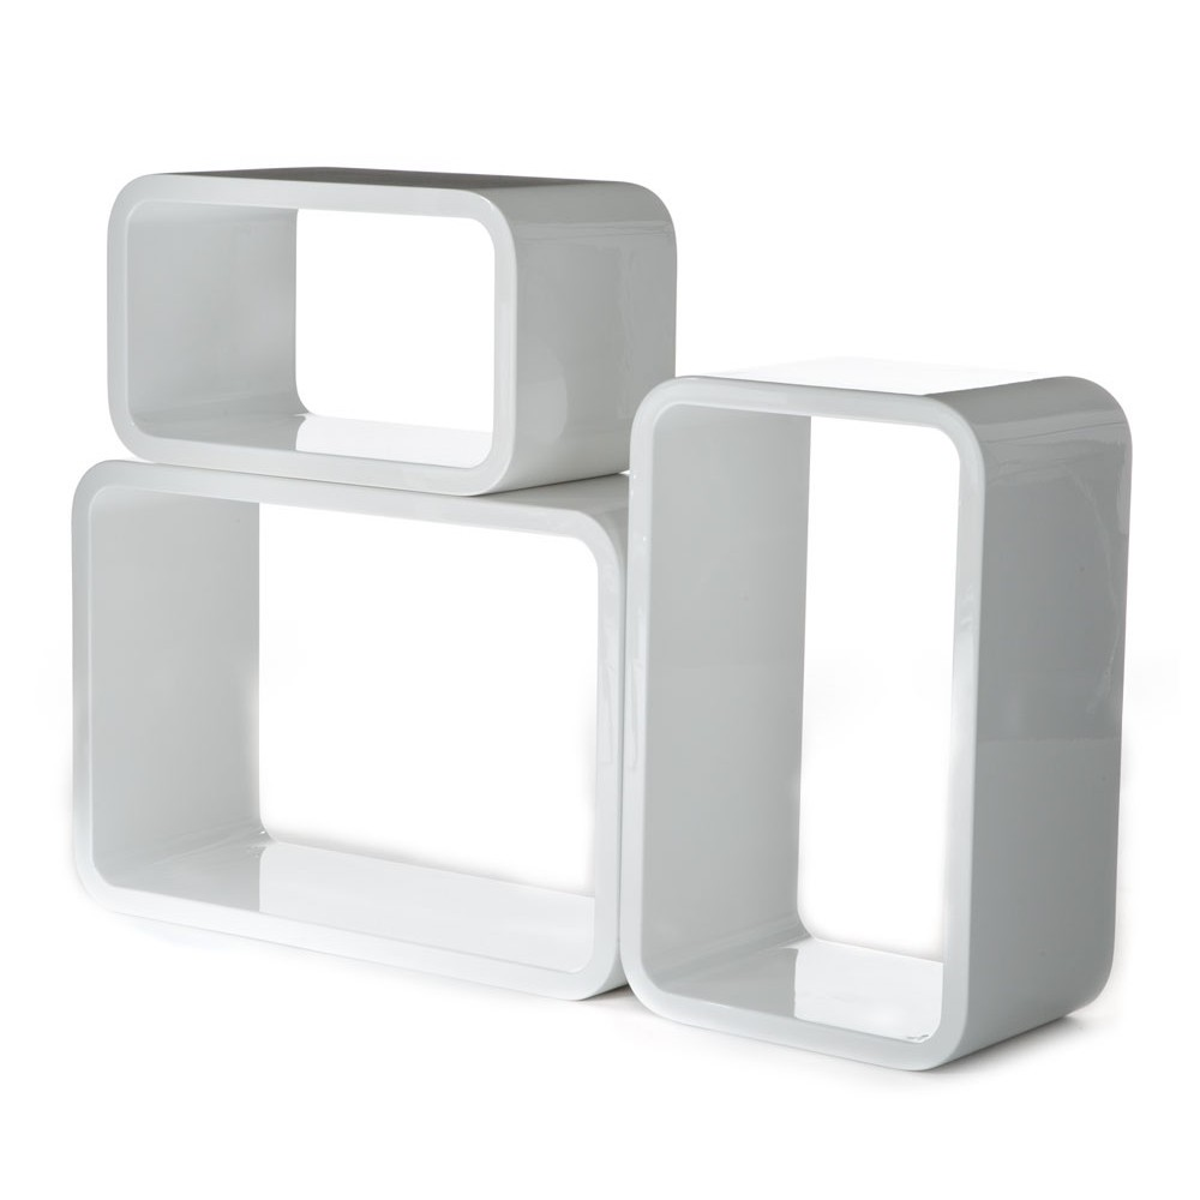 set 3 cubi kuadra da parete mensole rettangolari per arredo